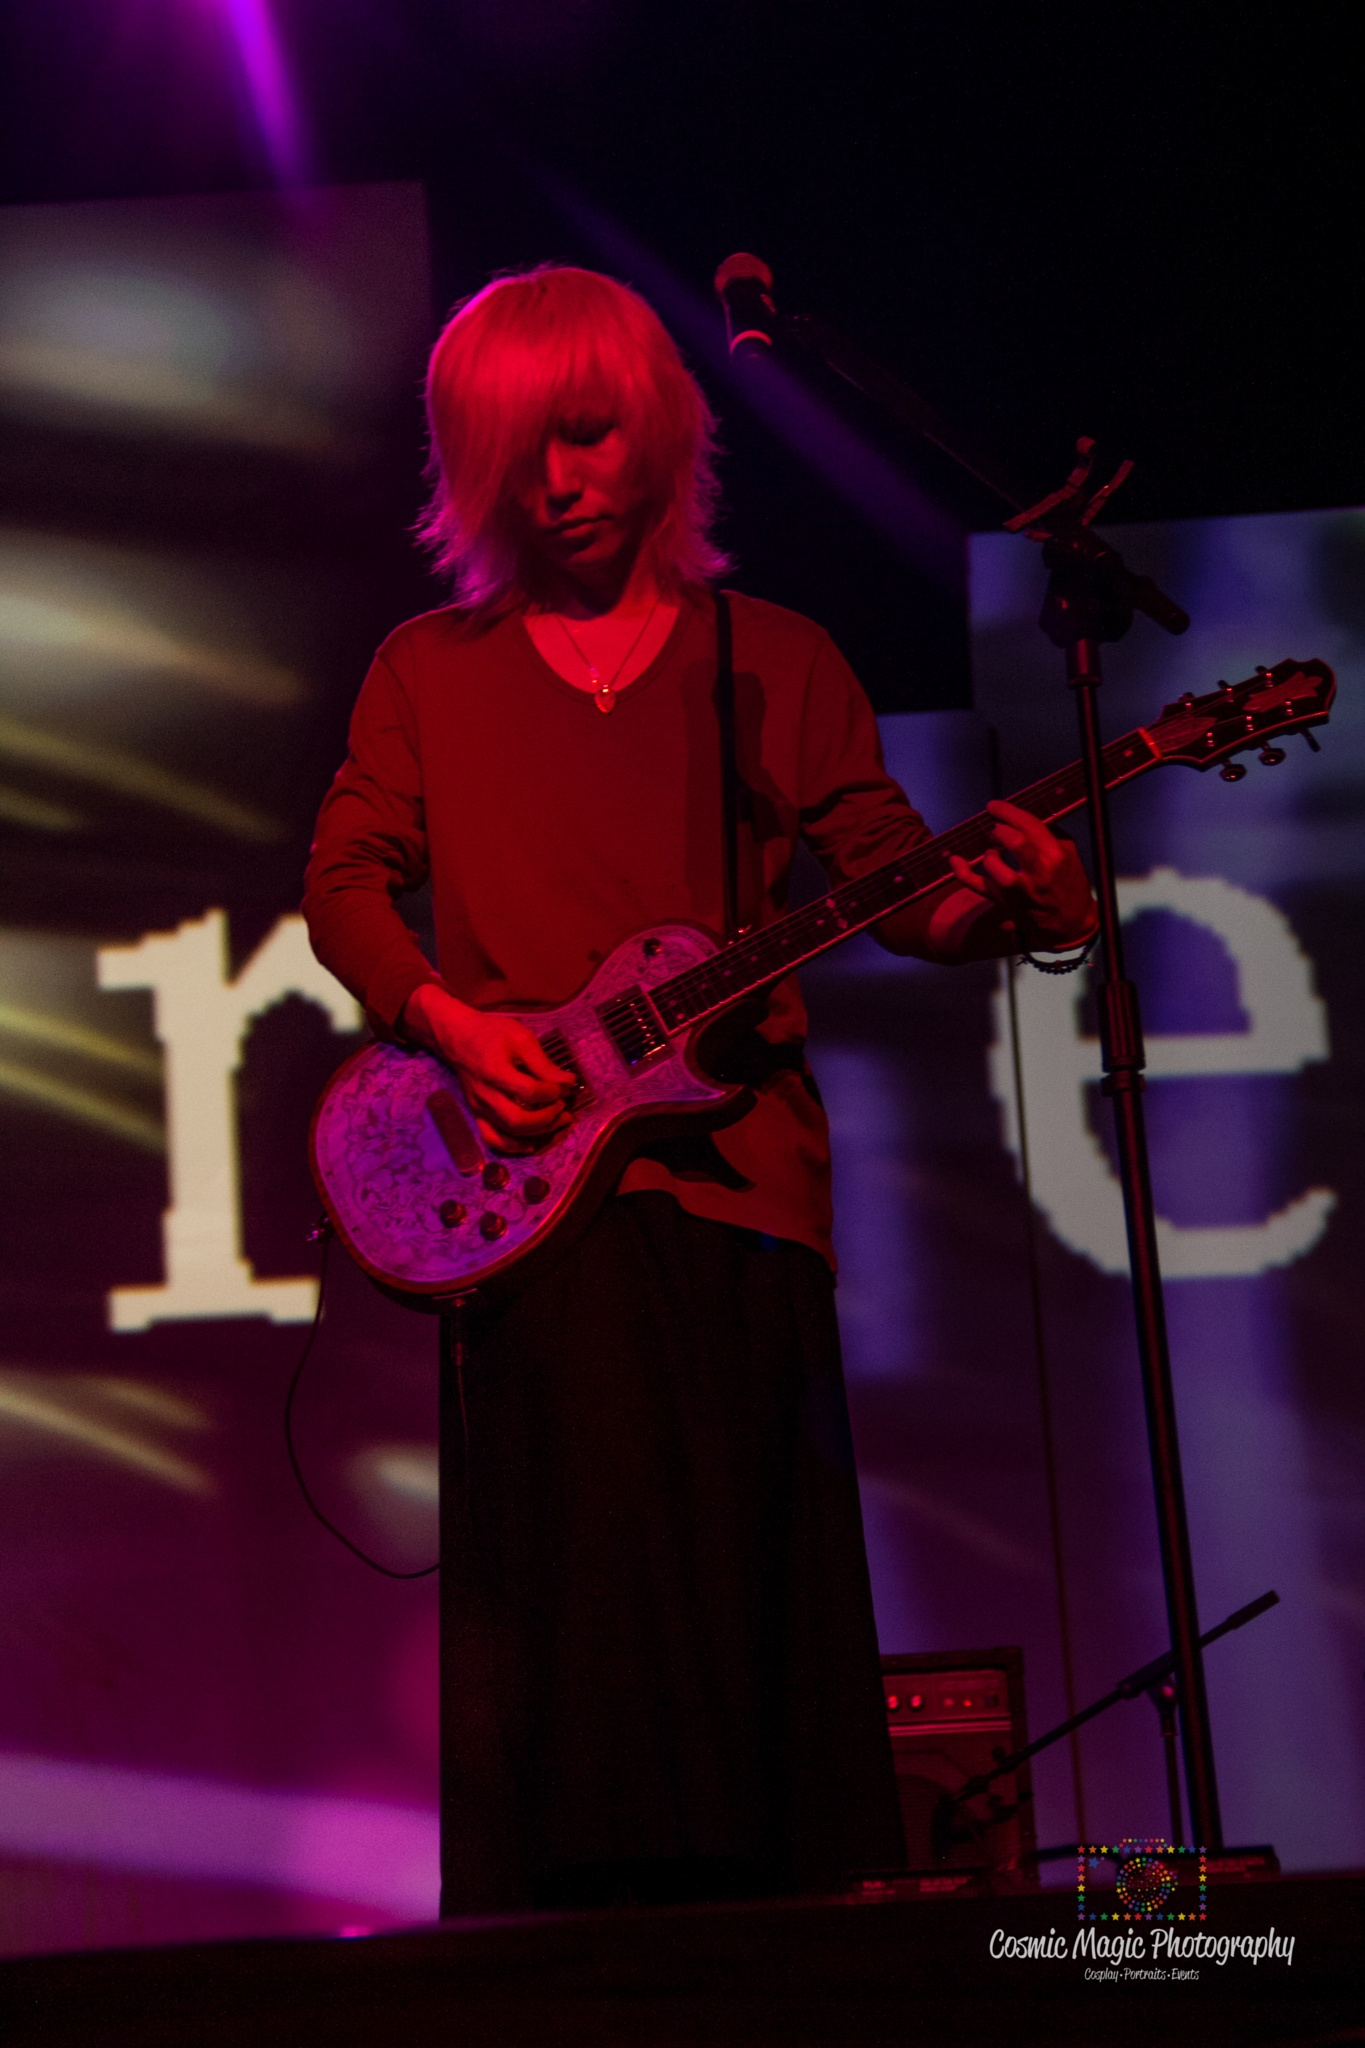 Anime Weekend Atlanta 2015 - universe Concert by Gina Adkins